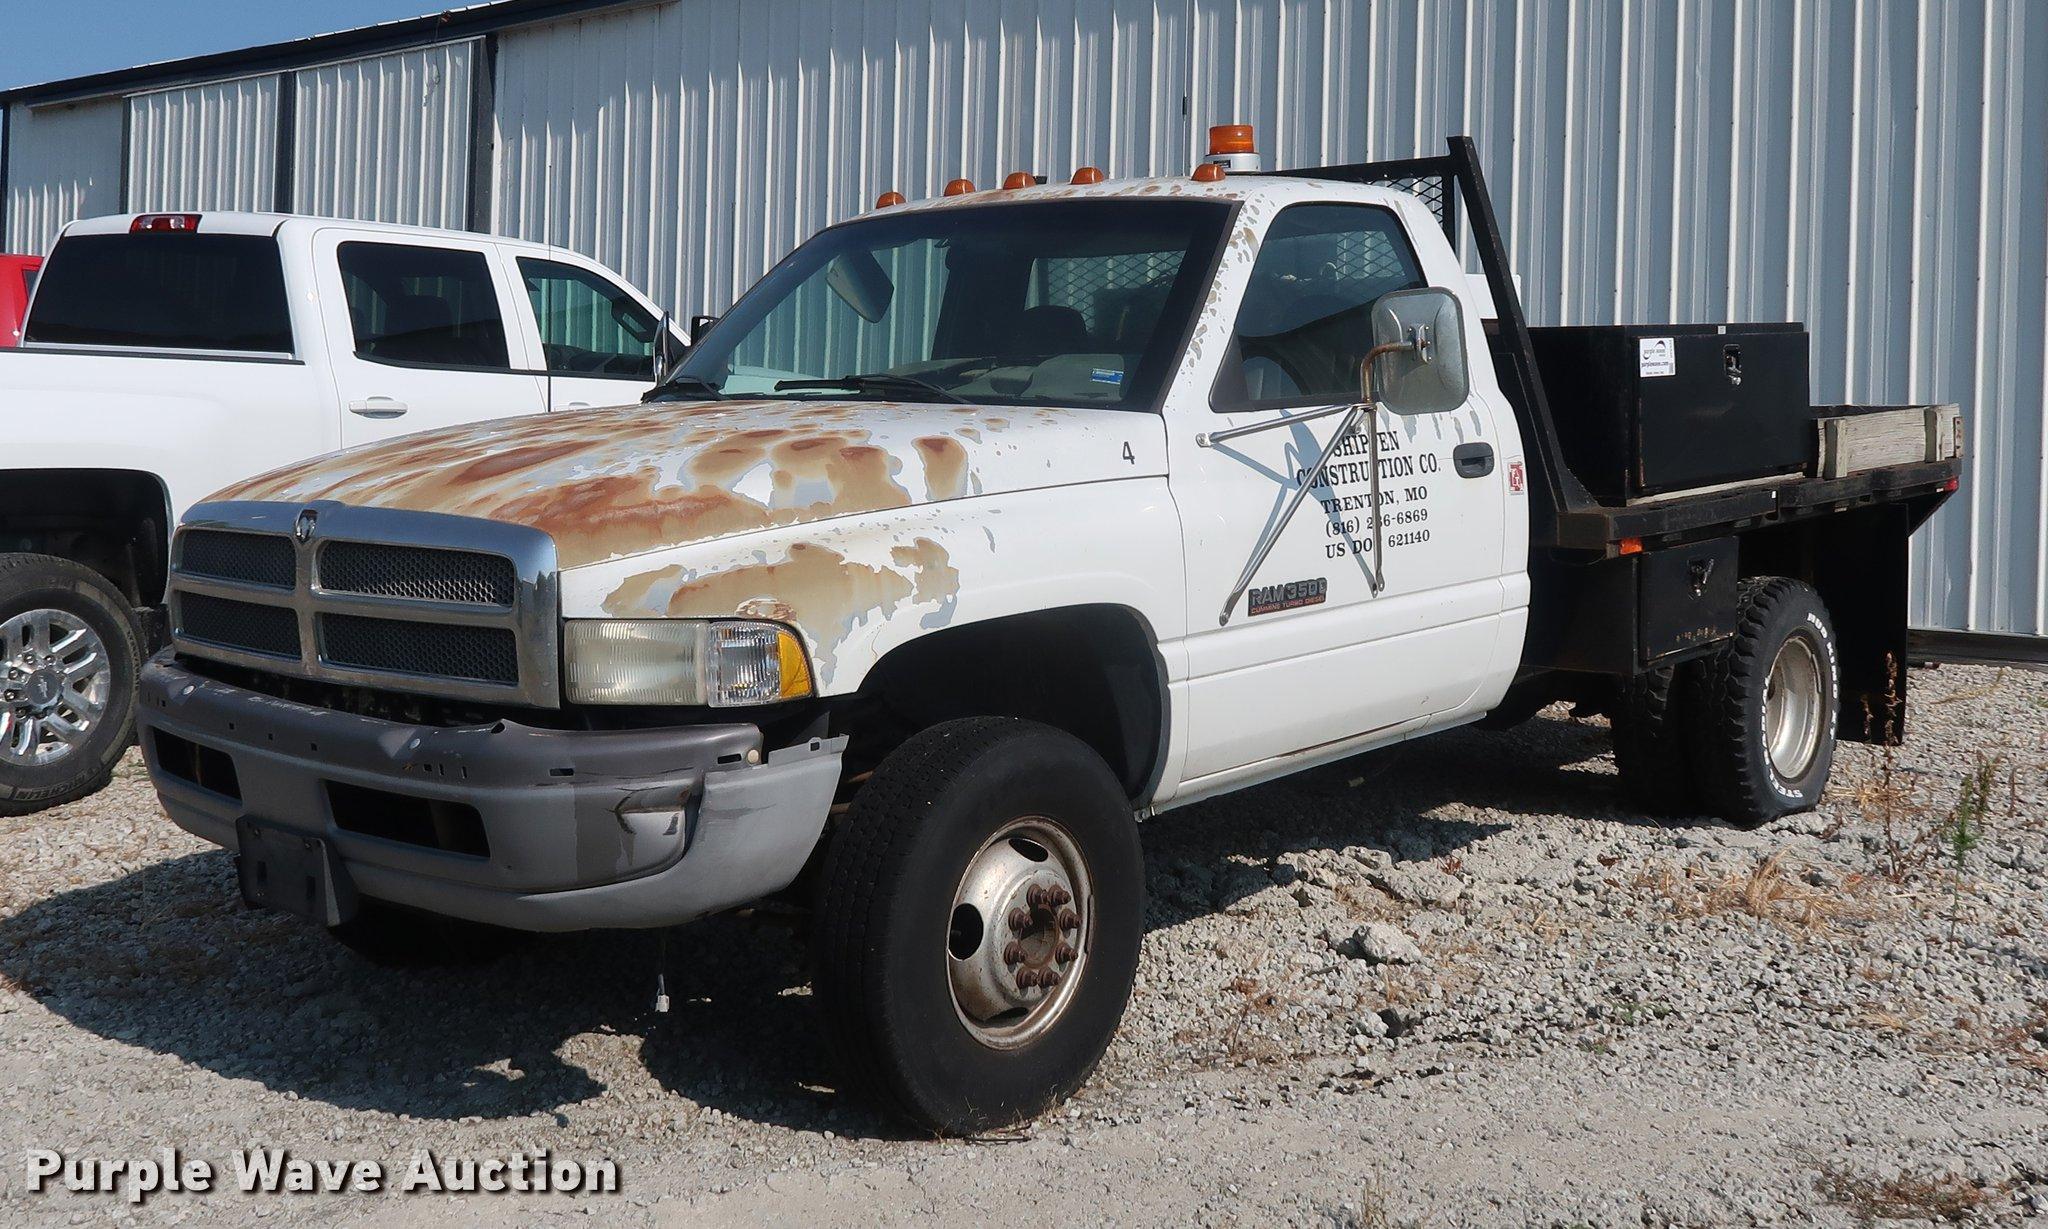 1996 Dodge Ram 3500 Flatbed Pickup Truck In Trenton Mo Item Df2342 Sold Purple Wave